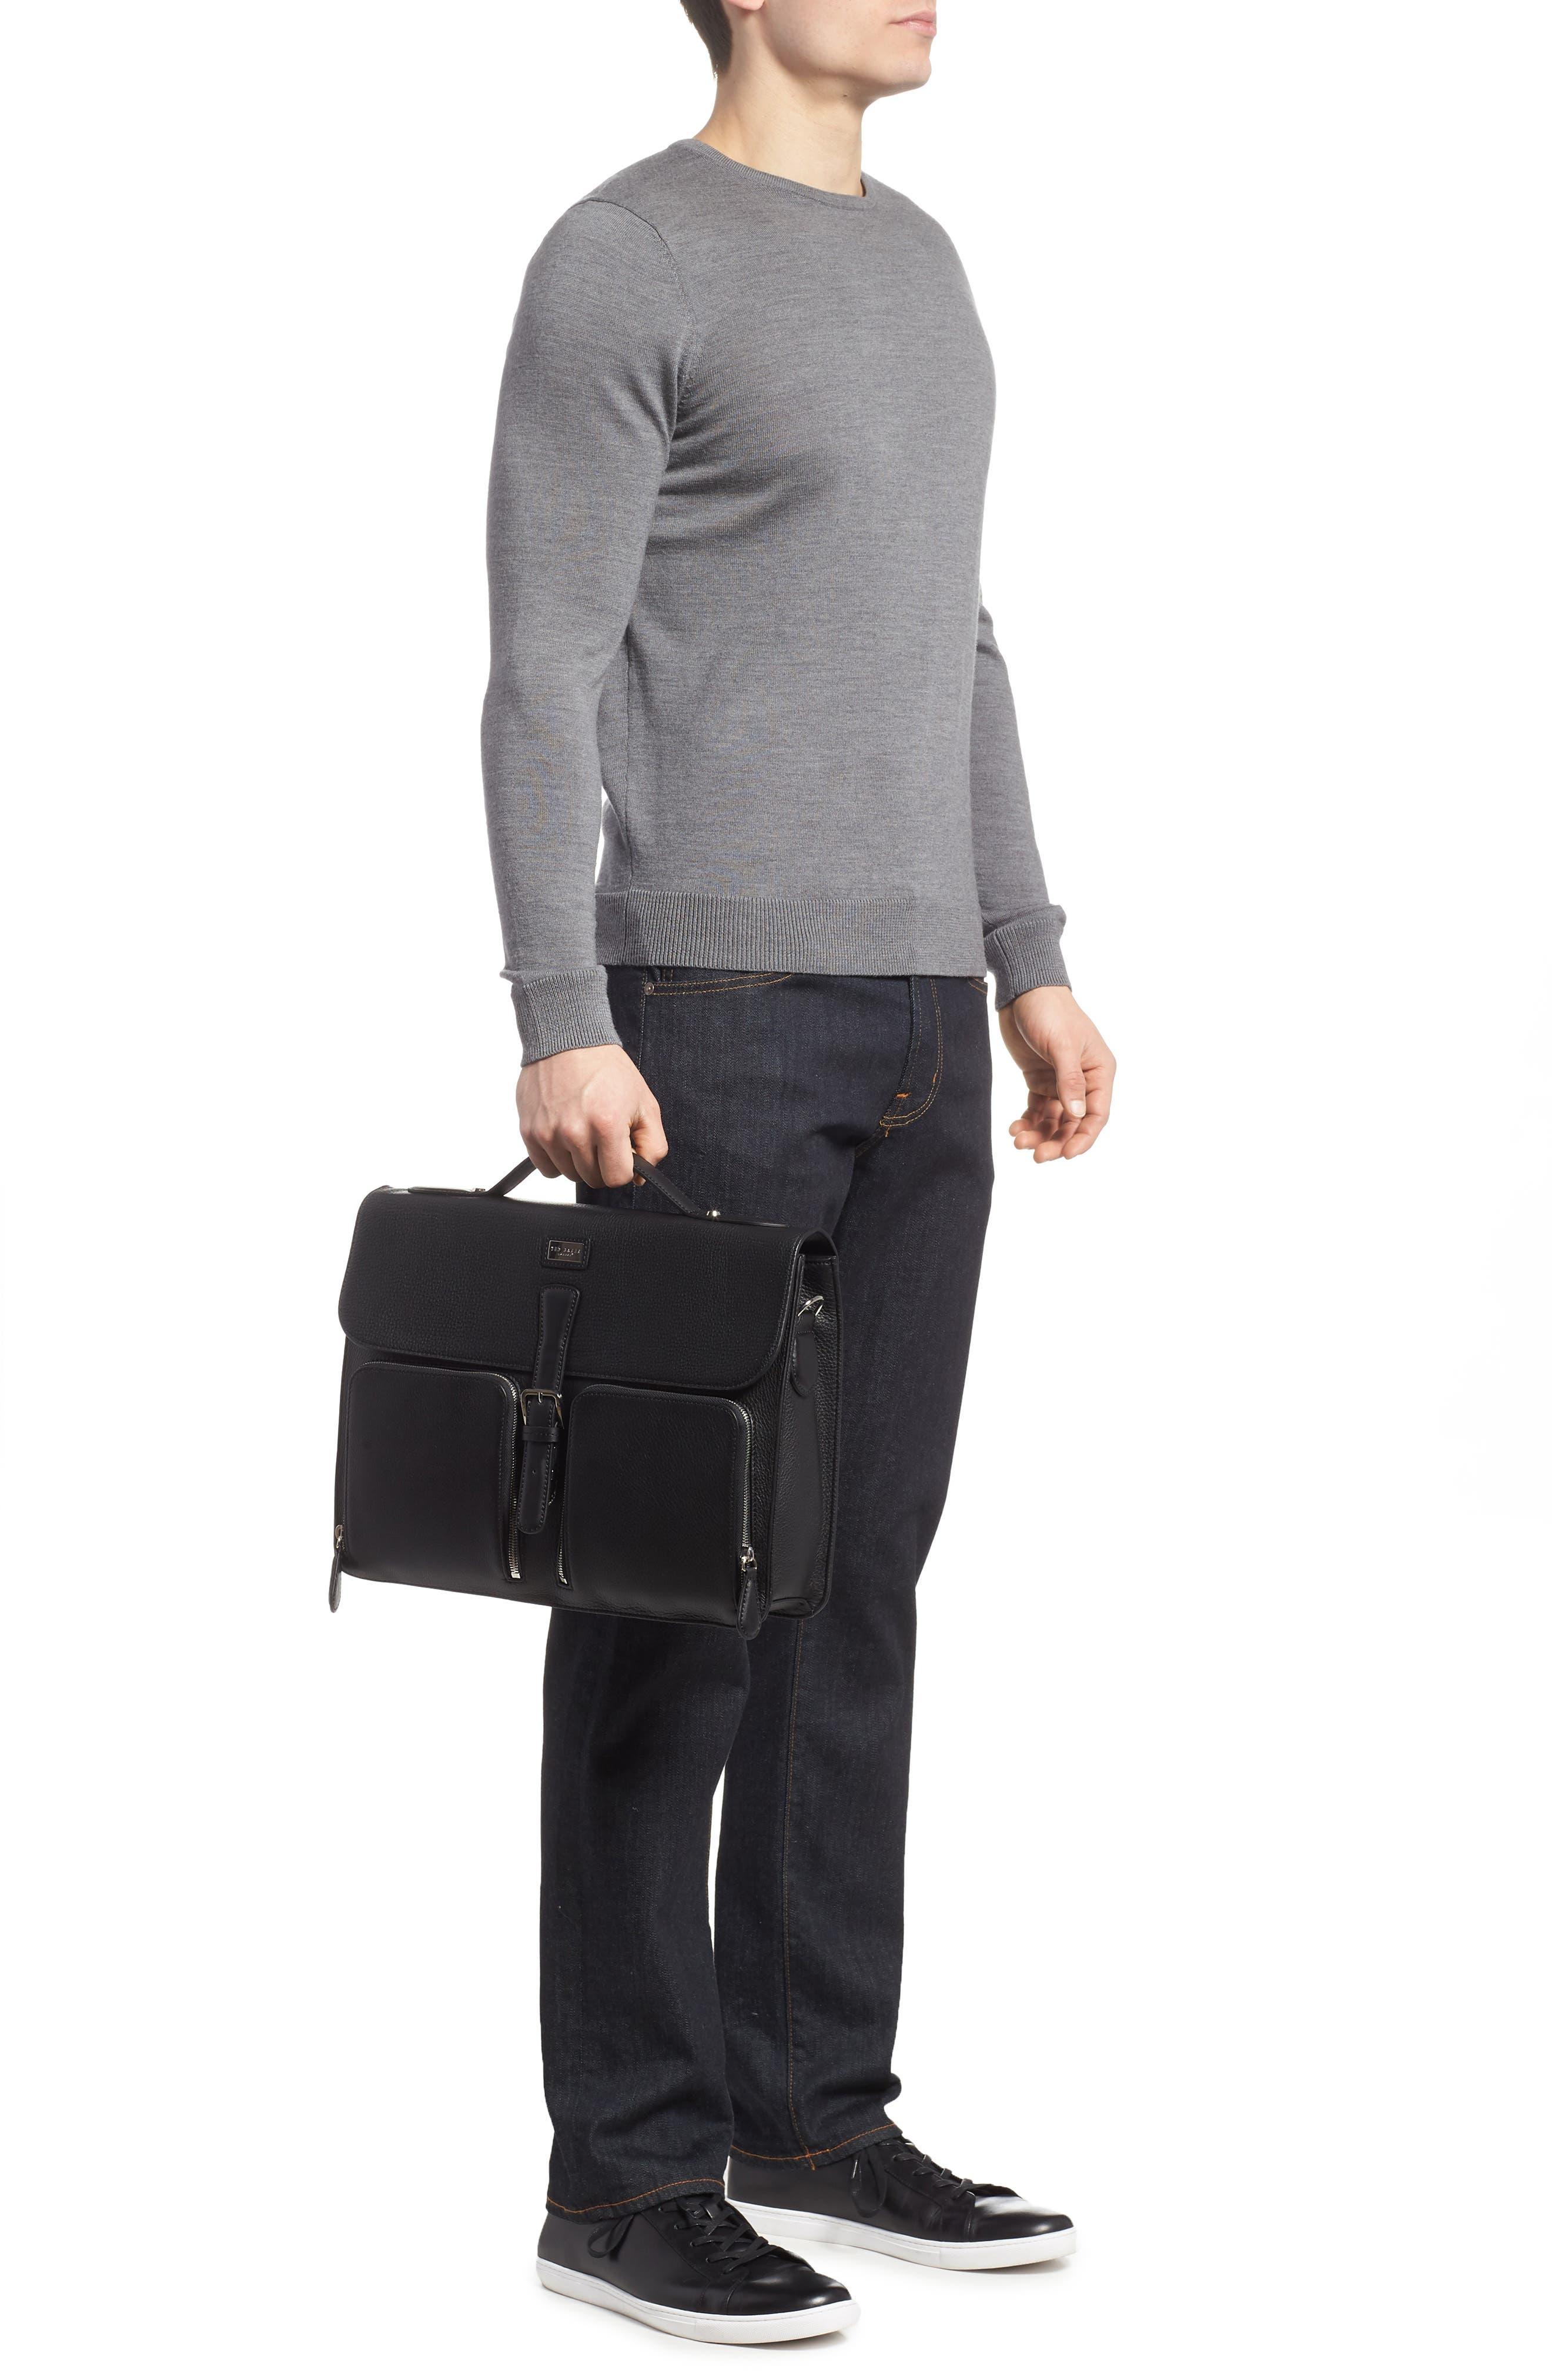 Munch Leather Satchel Briefcase,                             Alternate thumbnail 2, color,                             Black